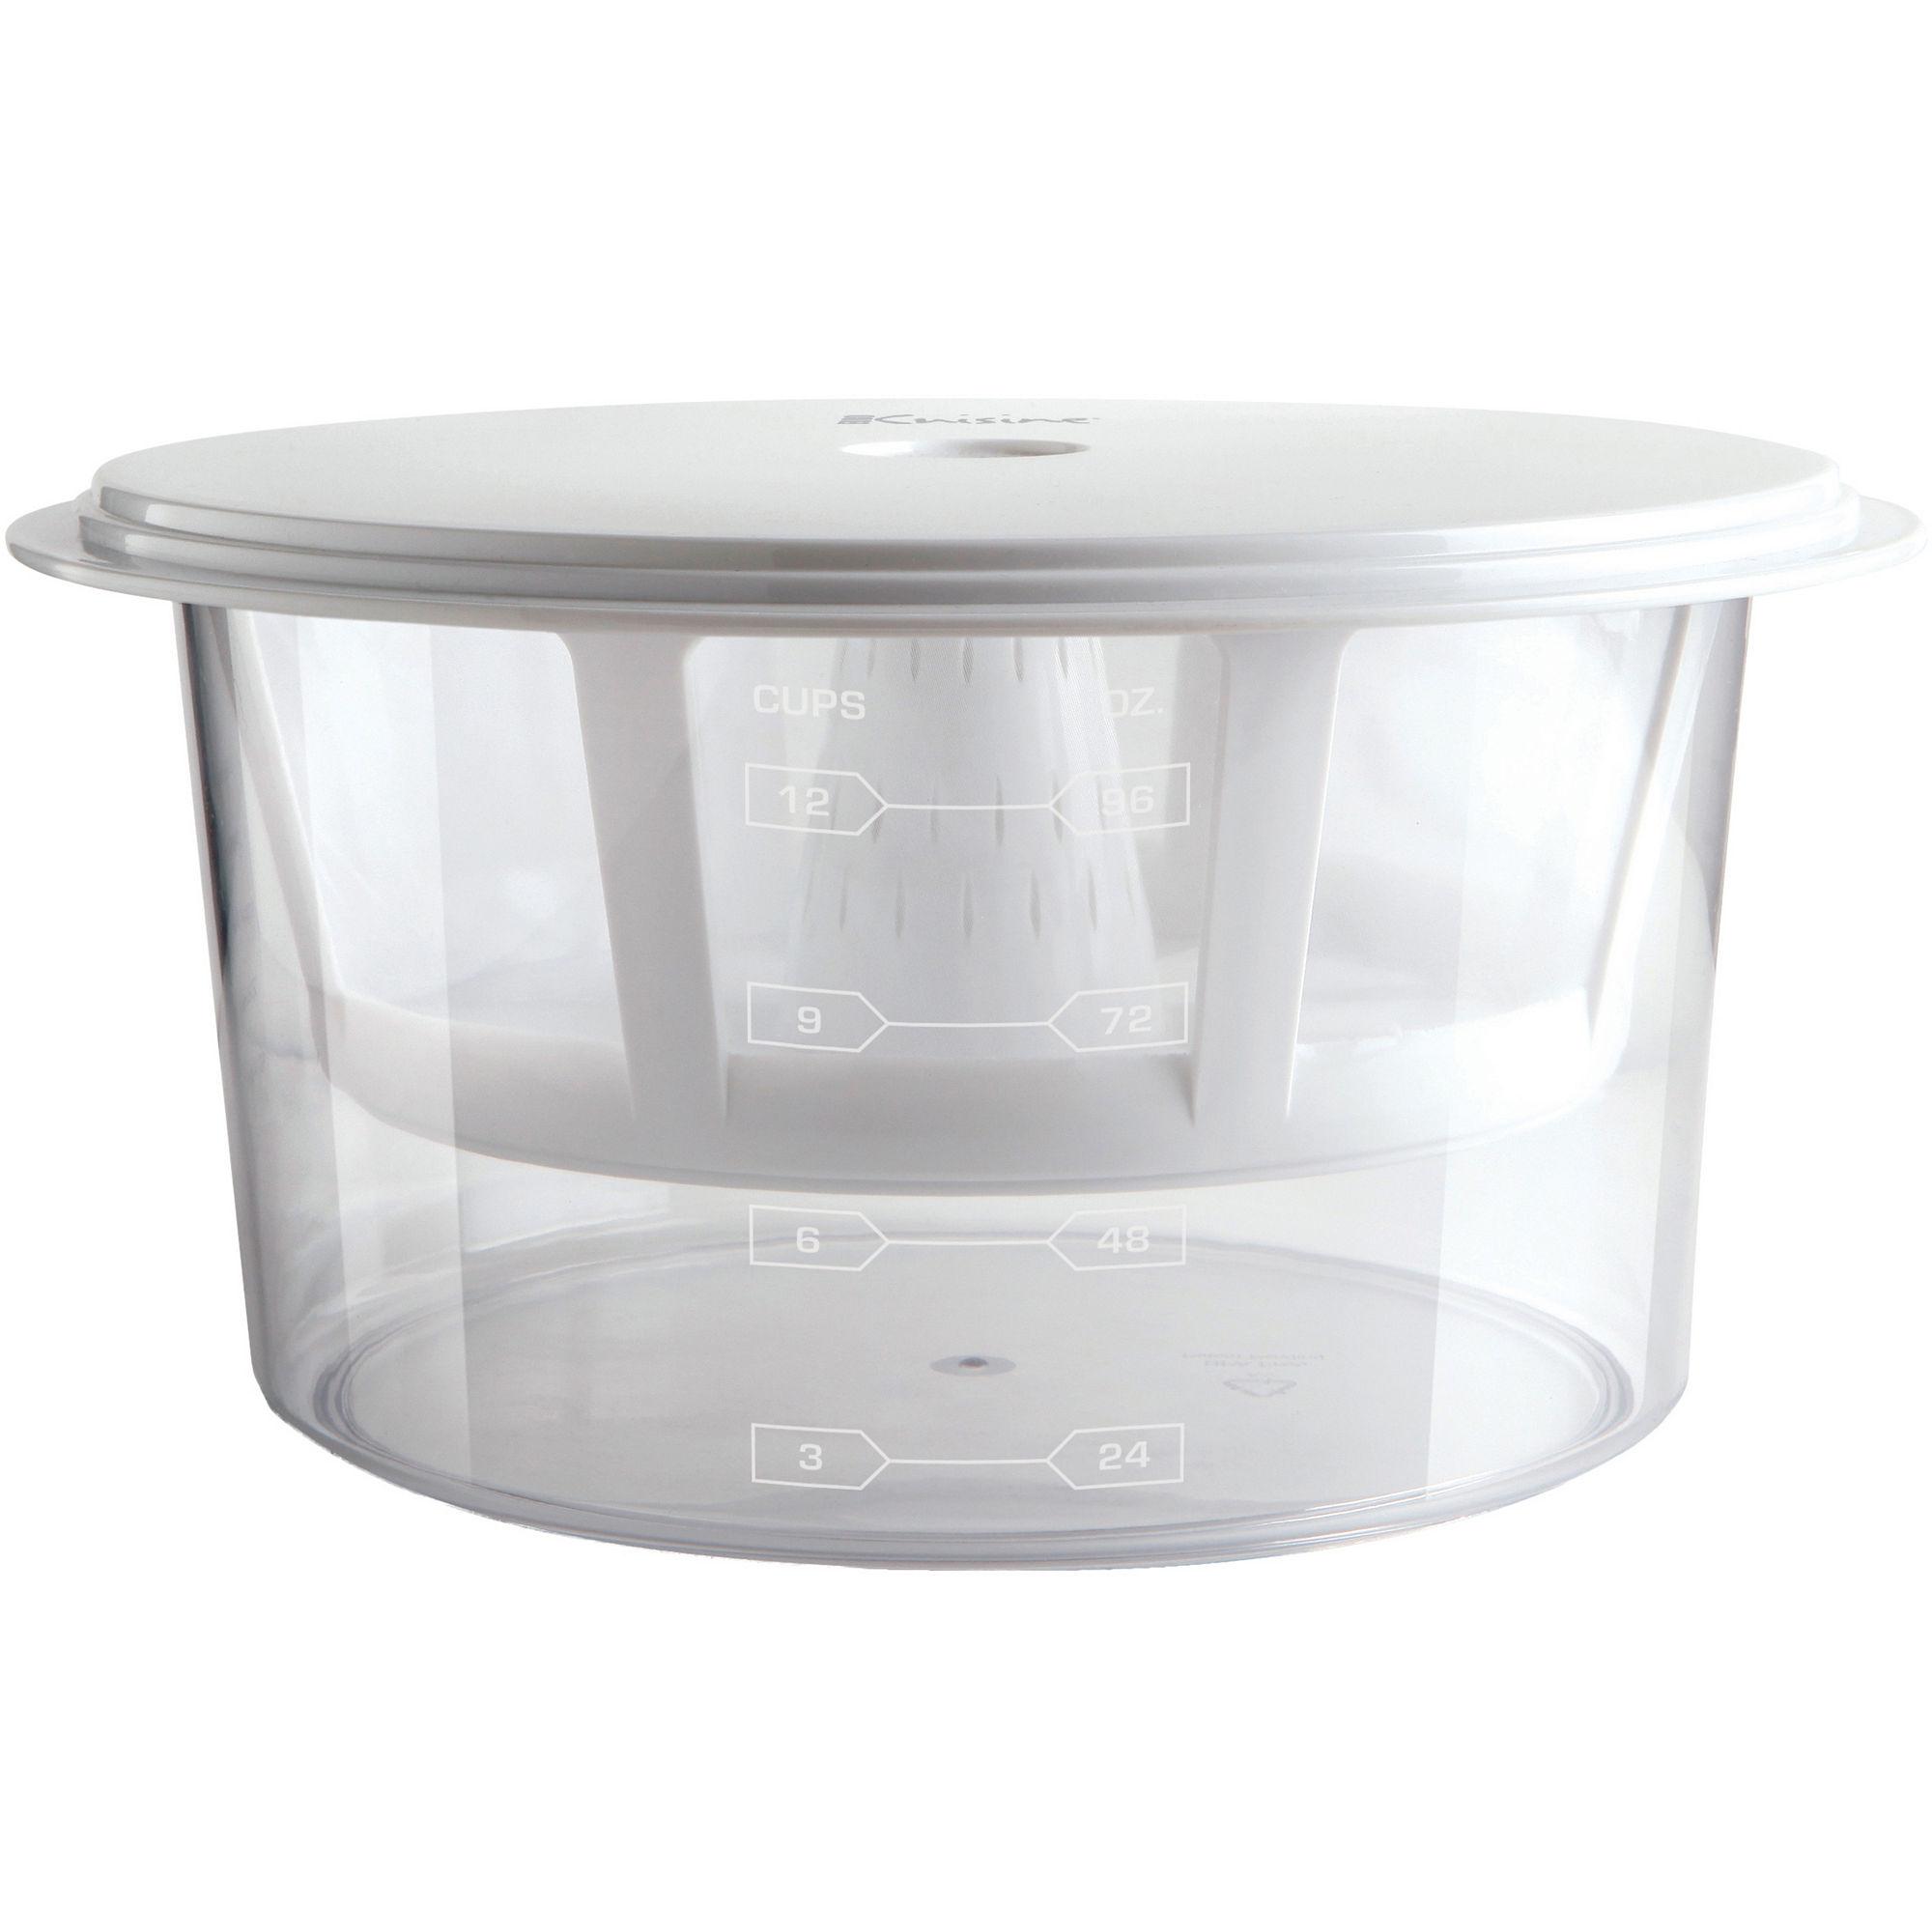 737770000502 upc euro cuisine gy50 greek yogurt maker upc lookup. Black Bedroom Furniture Sets. Home Design Ideas